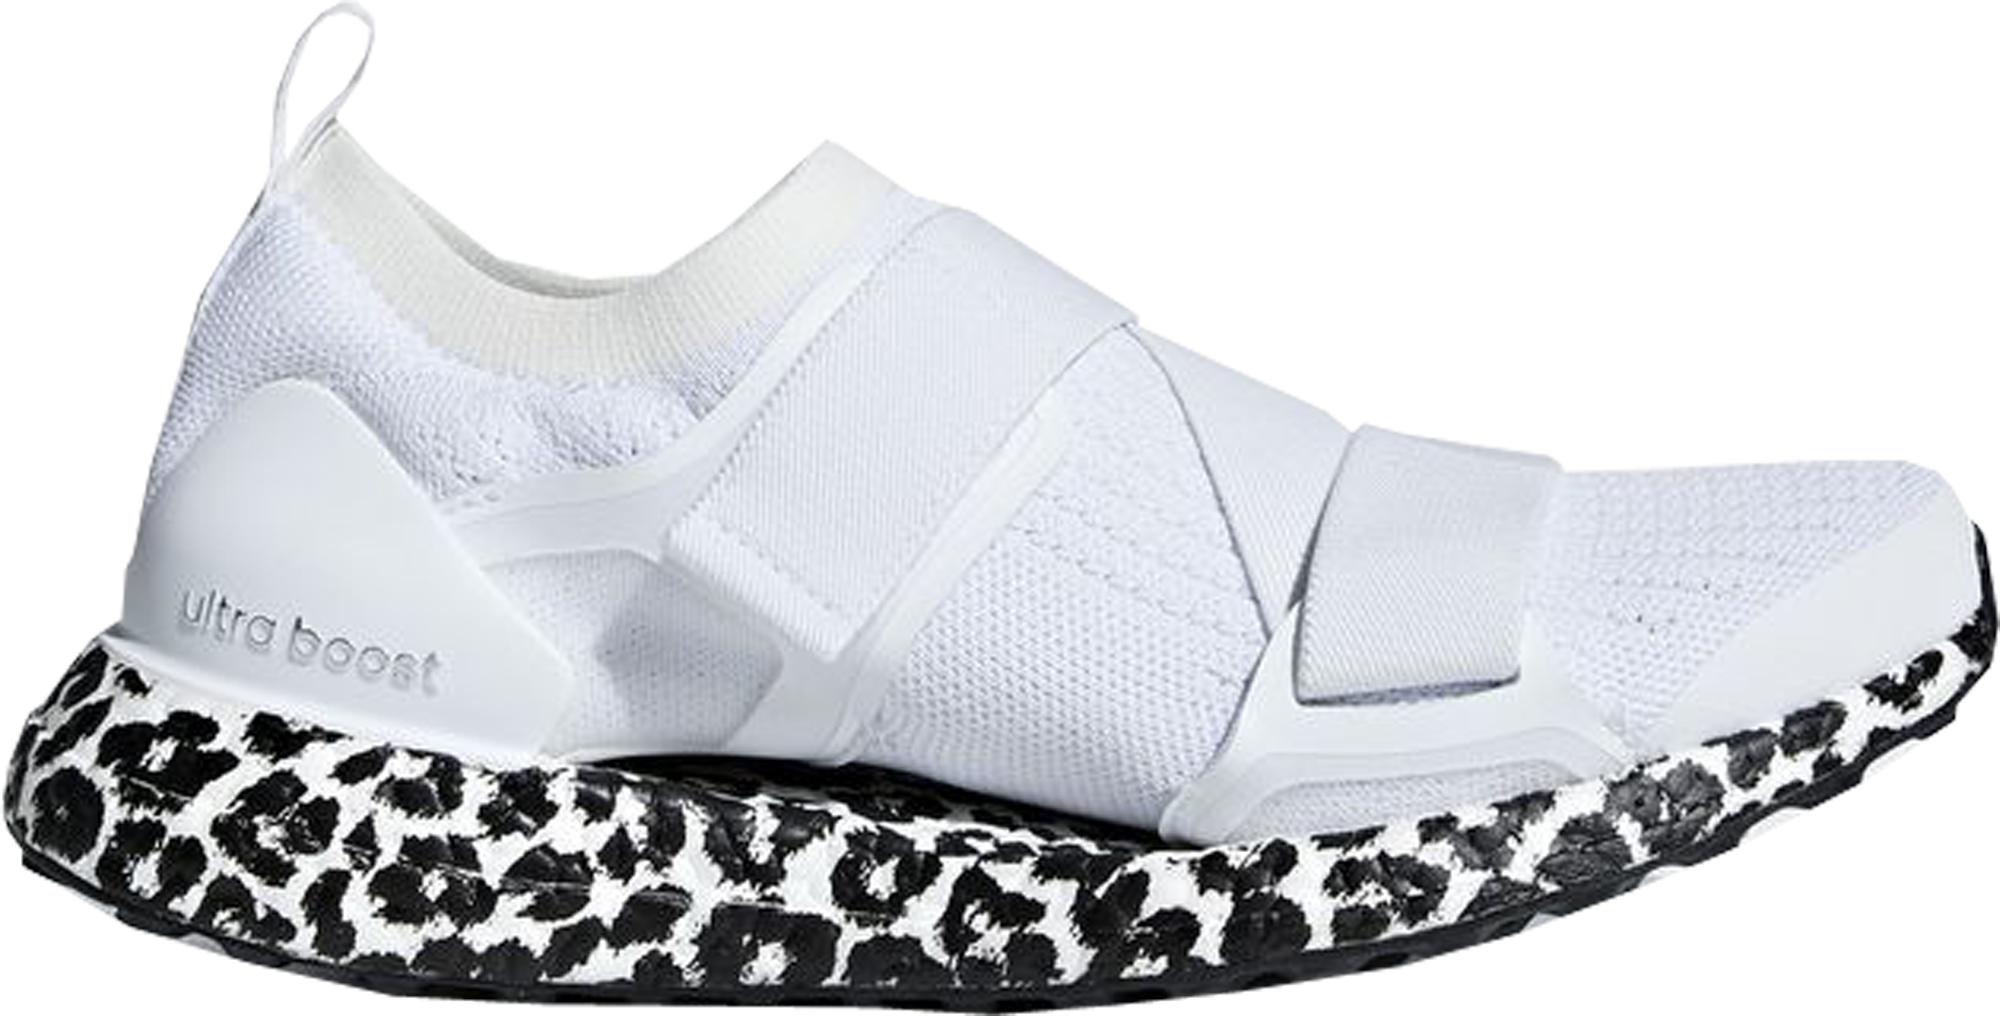 AC7548 Ultraboost X Women Men Running Shoes Sneakers White Adidas